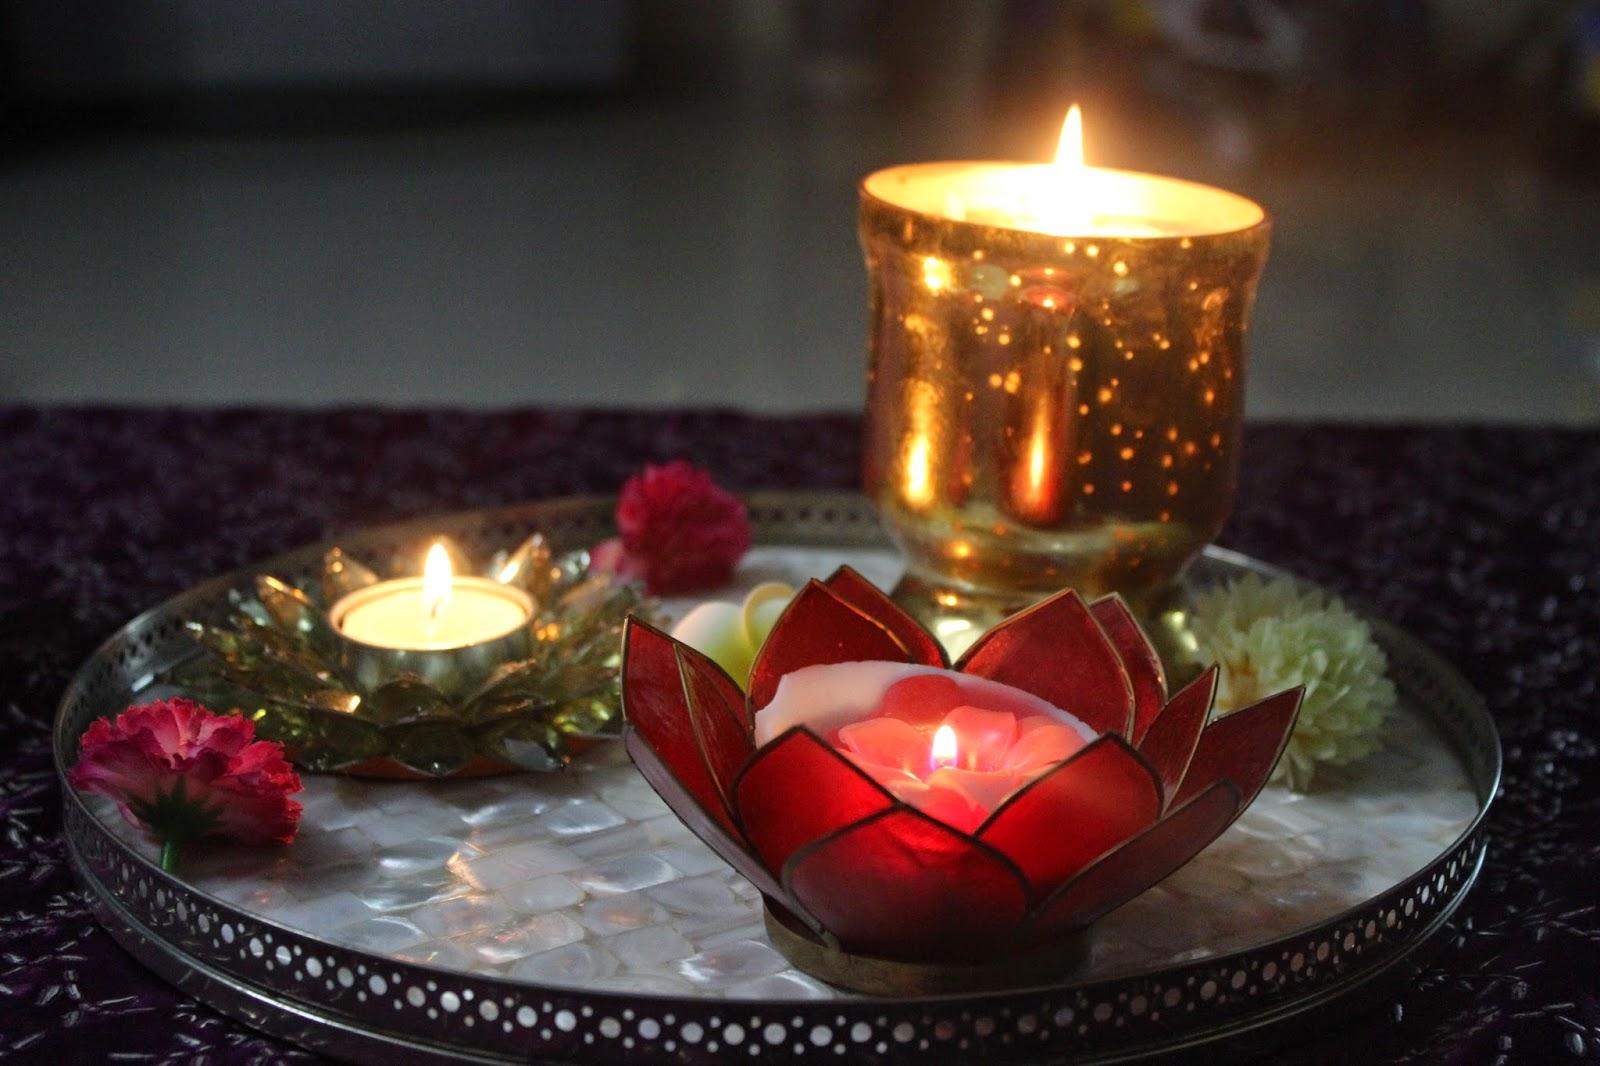 Diwali Decorations At Home Part 1